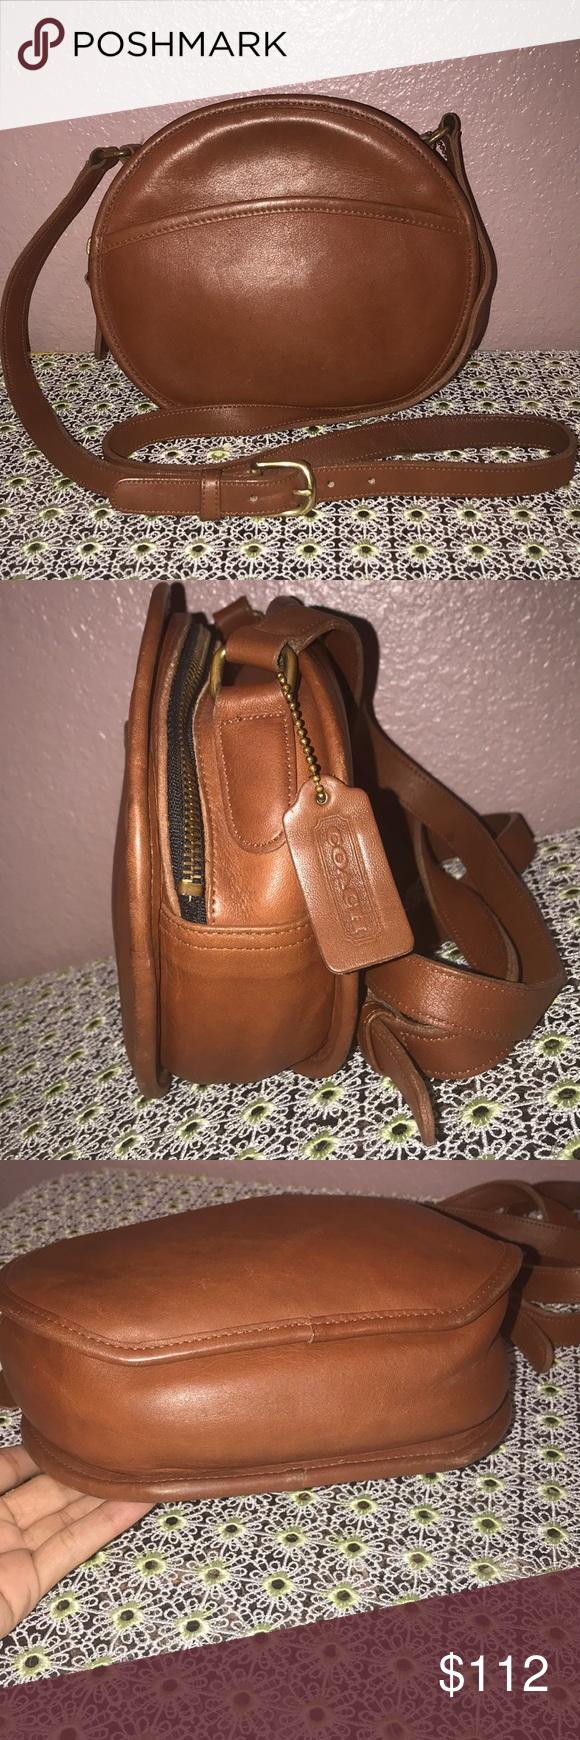 Spotted while shopping on Poshmark  Vintage Coach Brown Crossbody Bag   9901!  poshmark  fashion  shopping  style  Coach  Handbags c381976366